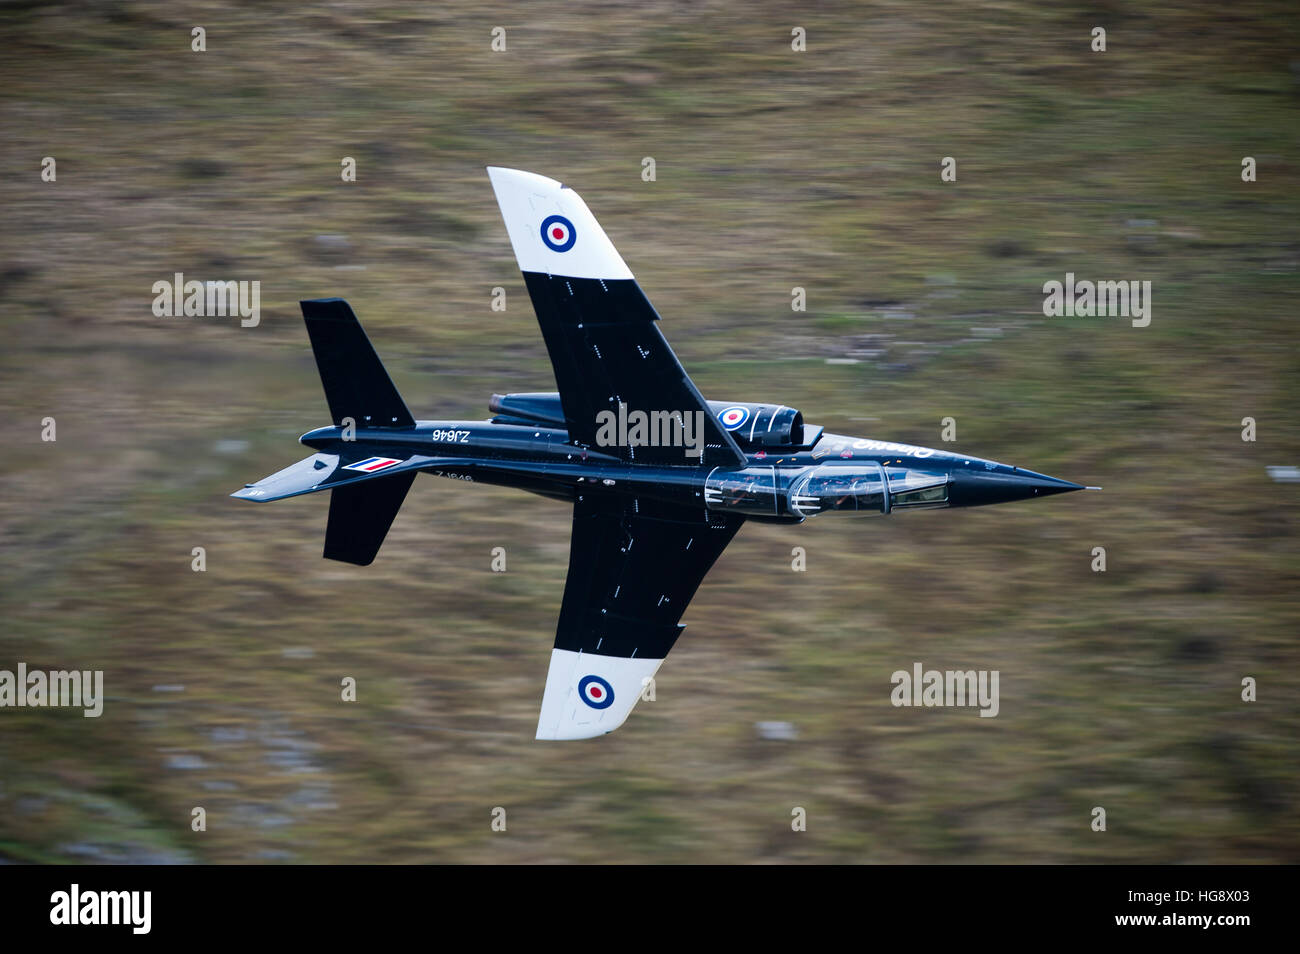 USAF F17 loew leve fling training in the mach loop wales UK - Stock Image